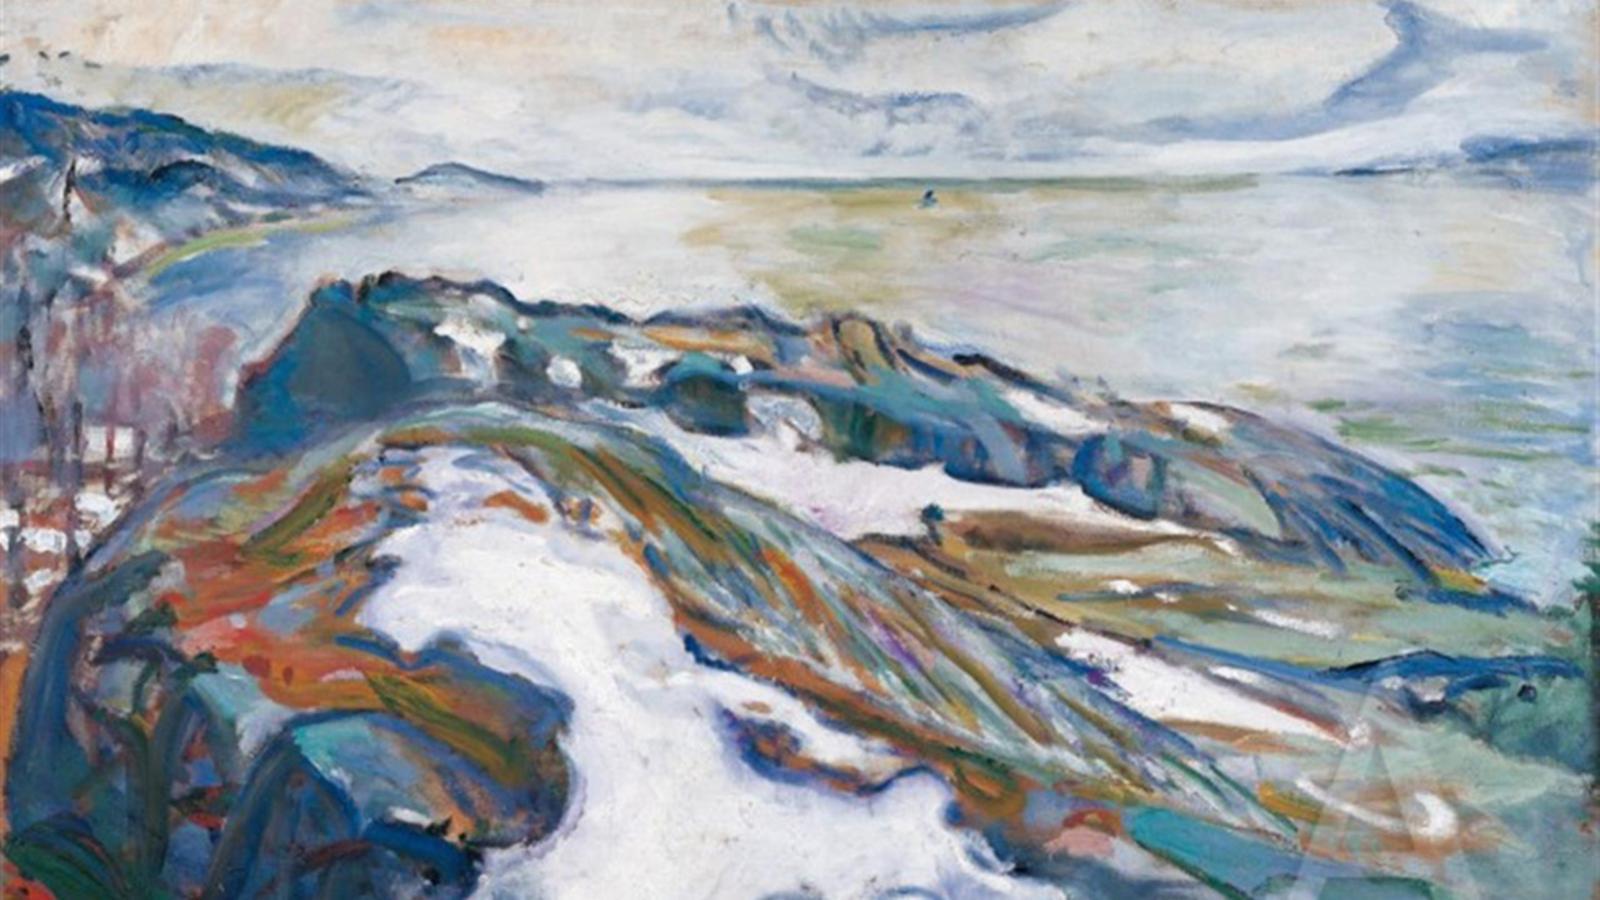 Winter Landscape, Edvard Munch (1915)